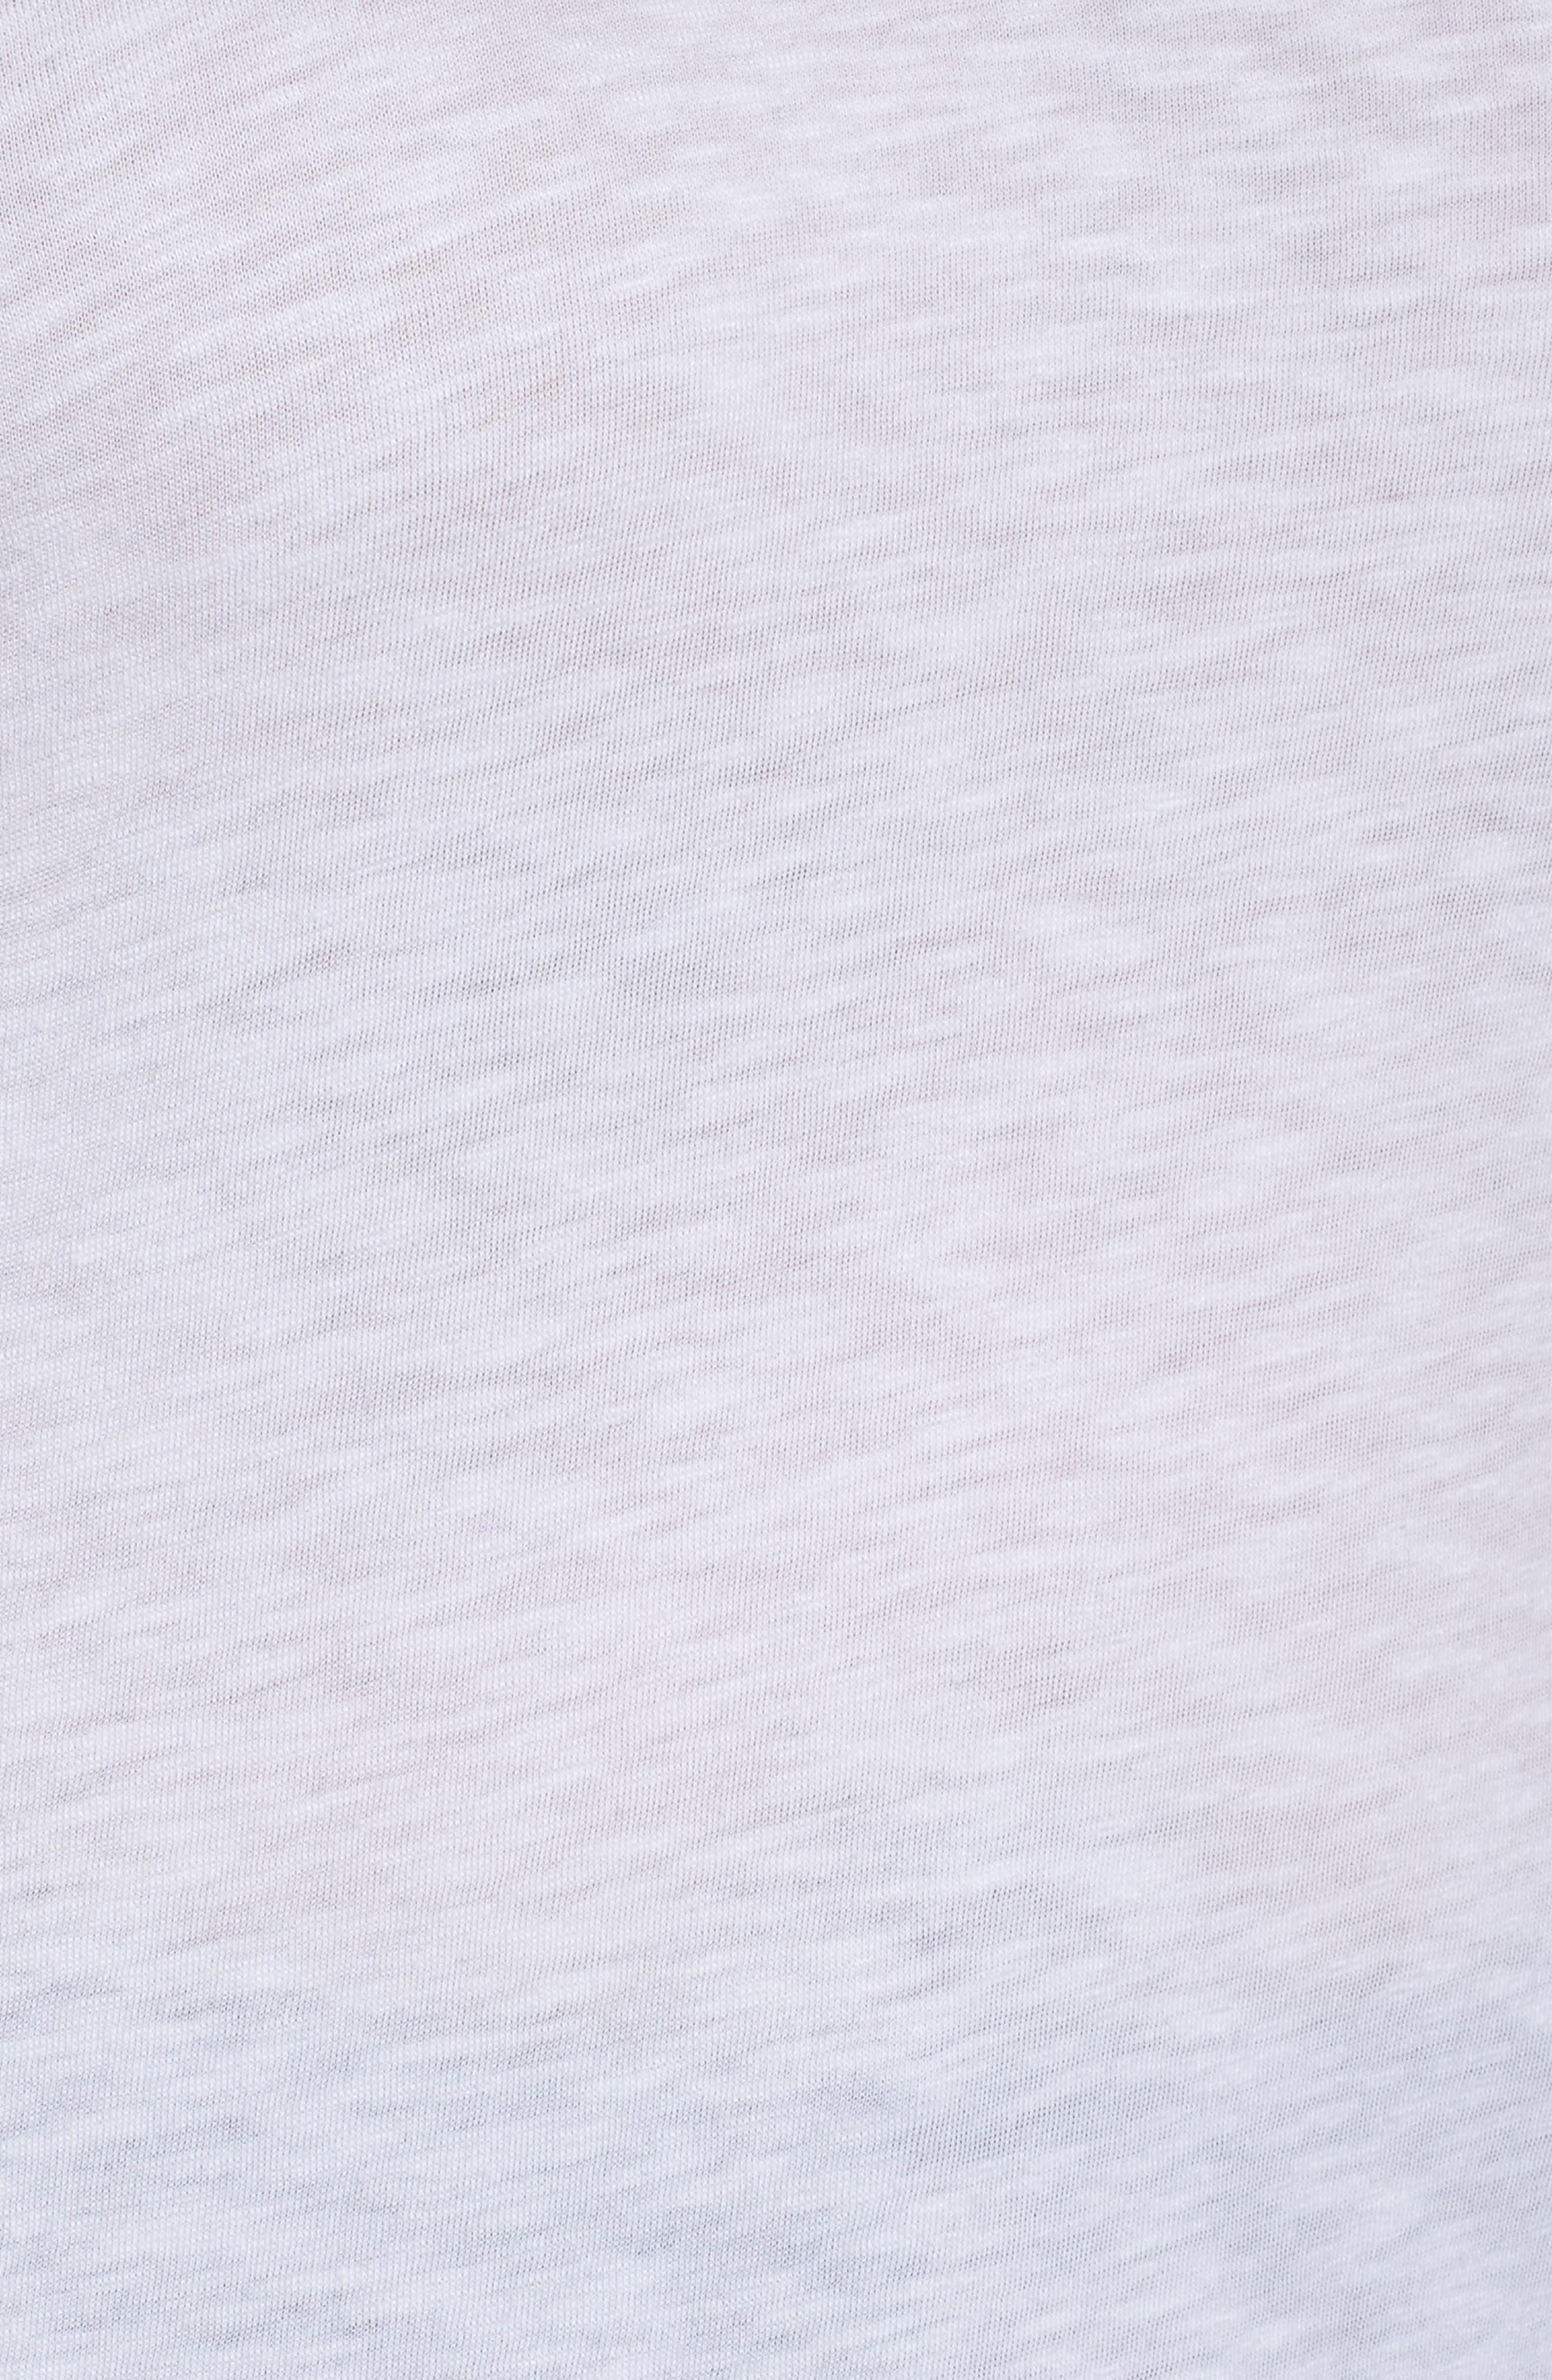 Long Sleeve Crewneck Tee,                             Alternate thumbnail 34, color,                             White